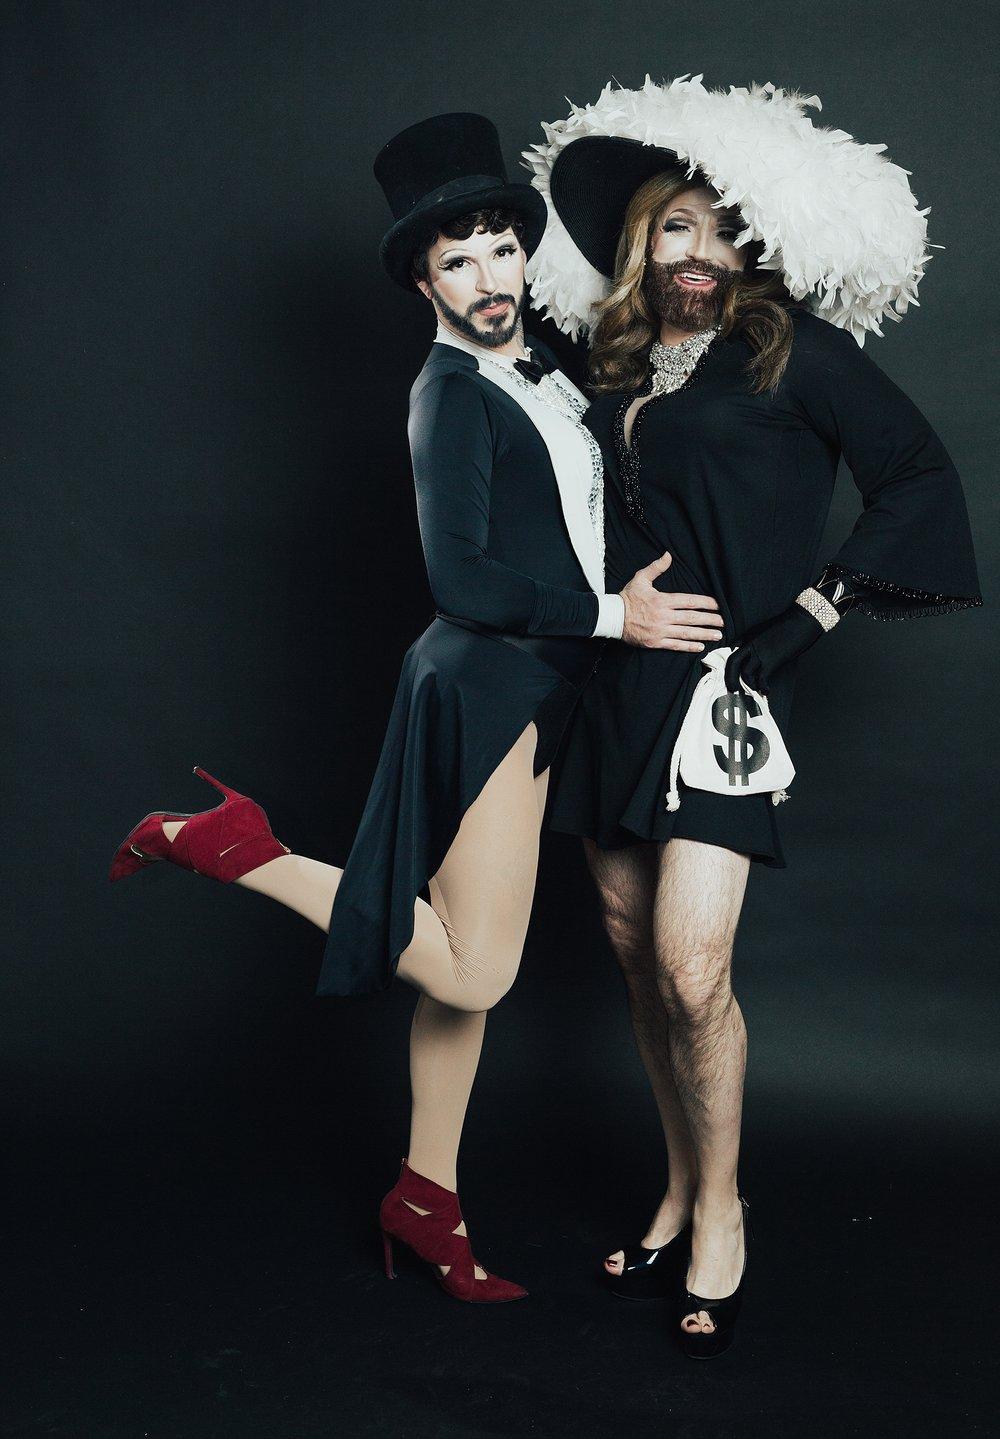 PGMC_Philadelphia_Gay_Mens_Chorus_Joe_Mac_Creative_LGBT_Photography_Voyeur_Gay_Philadelphia_0015.jpg